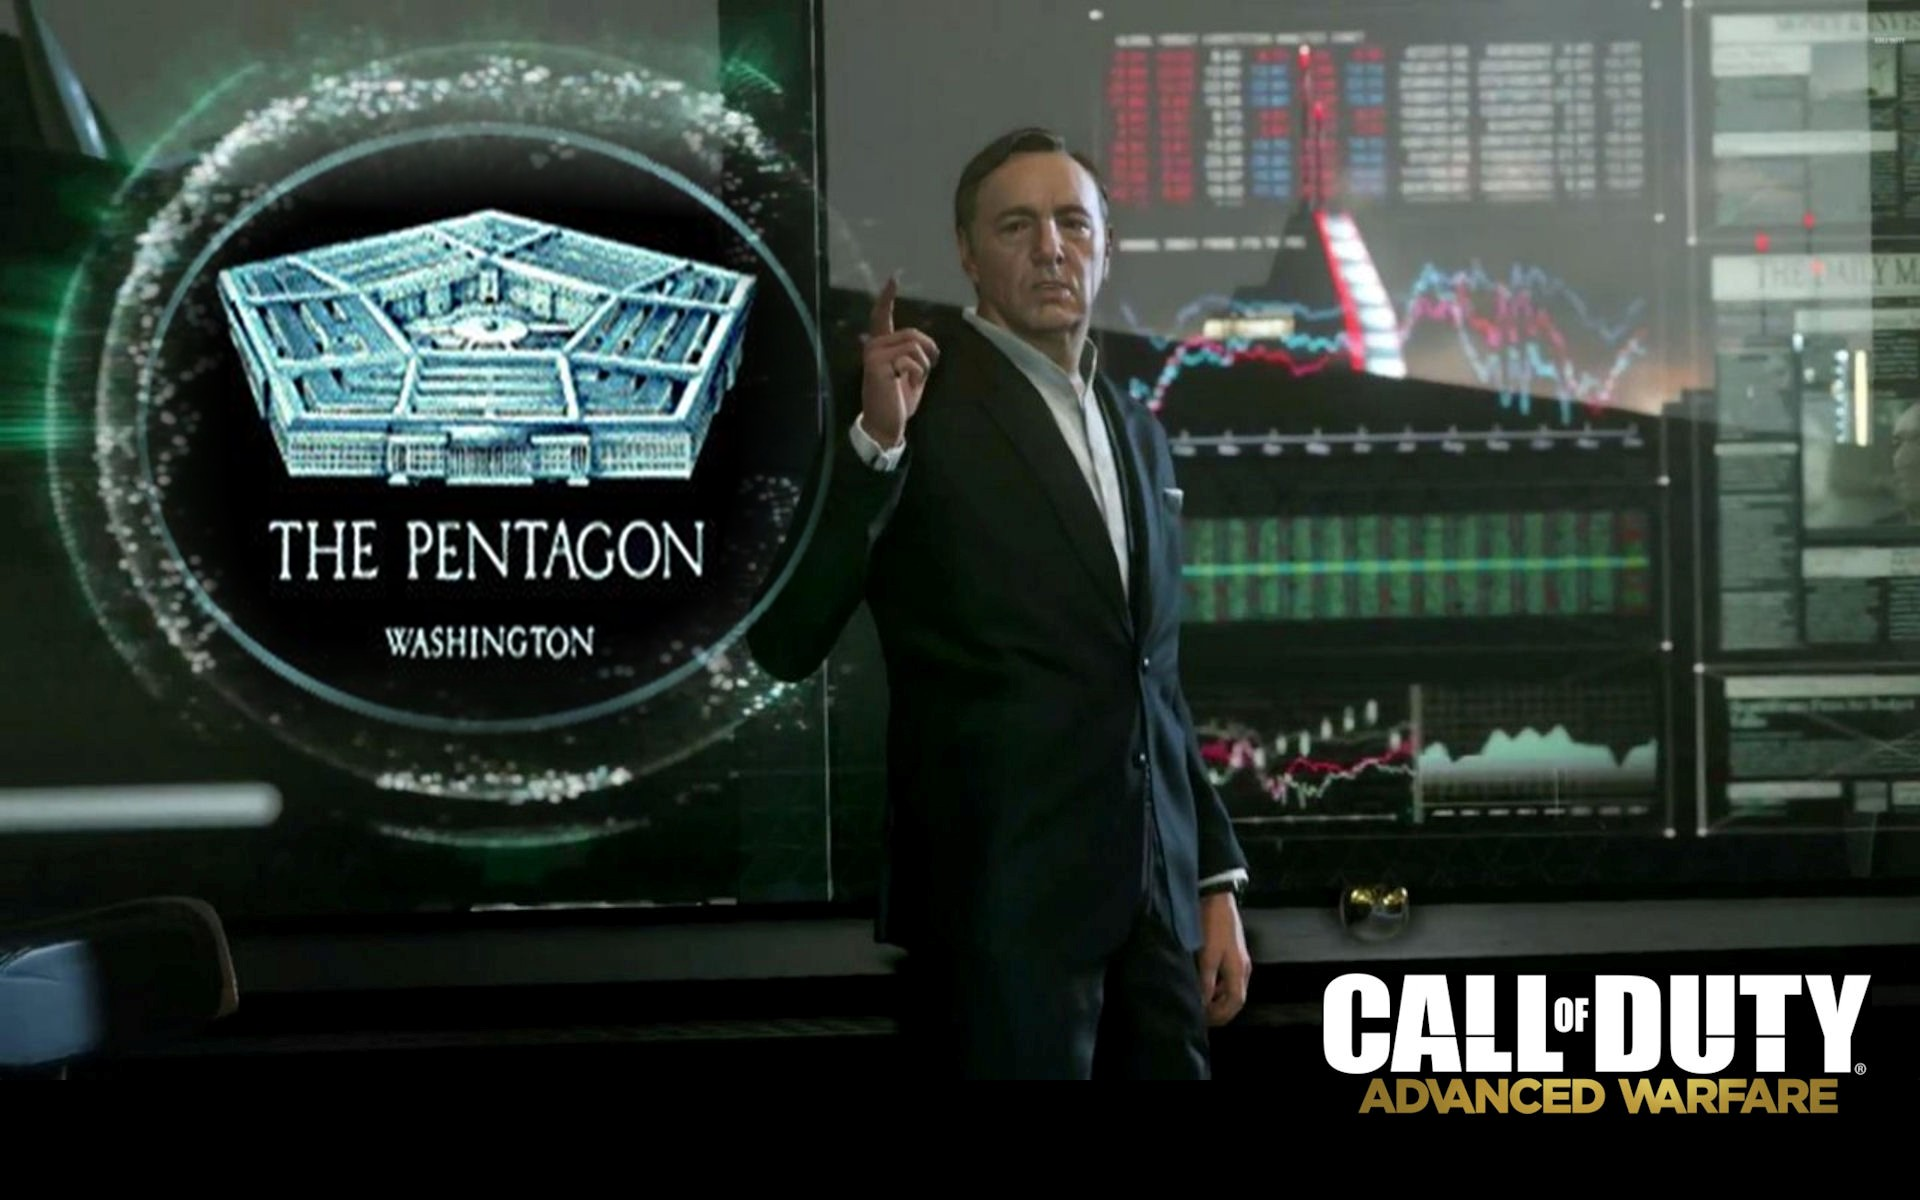 Call of duty advanced warfare is brainchild of pentagon - Spacey wallpaper ...